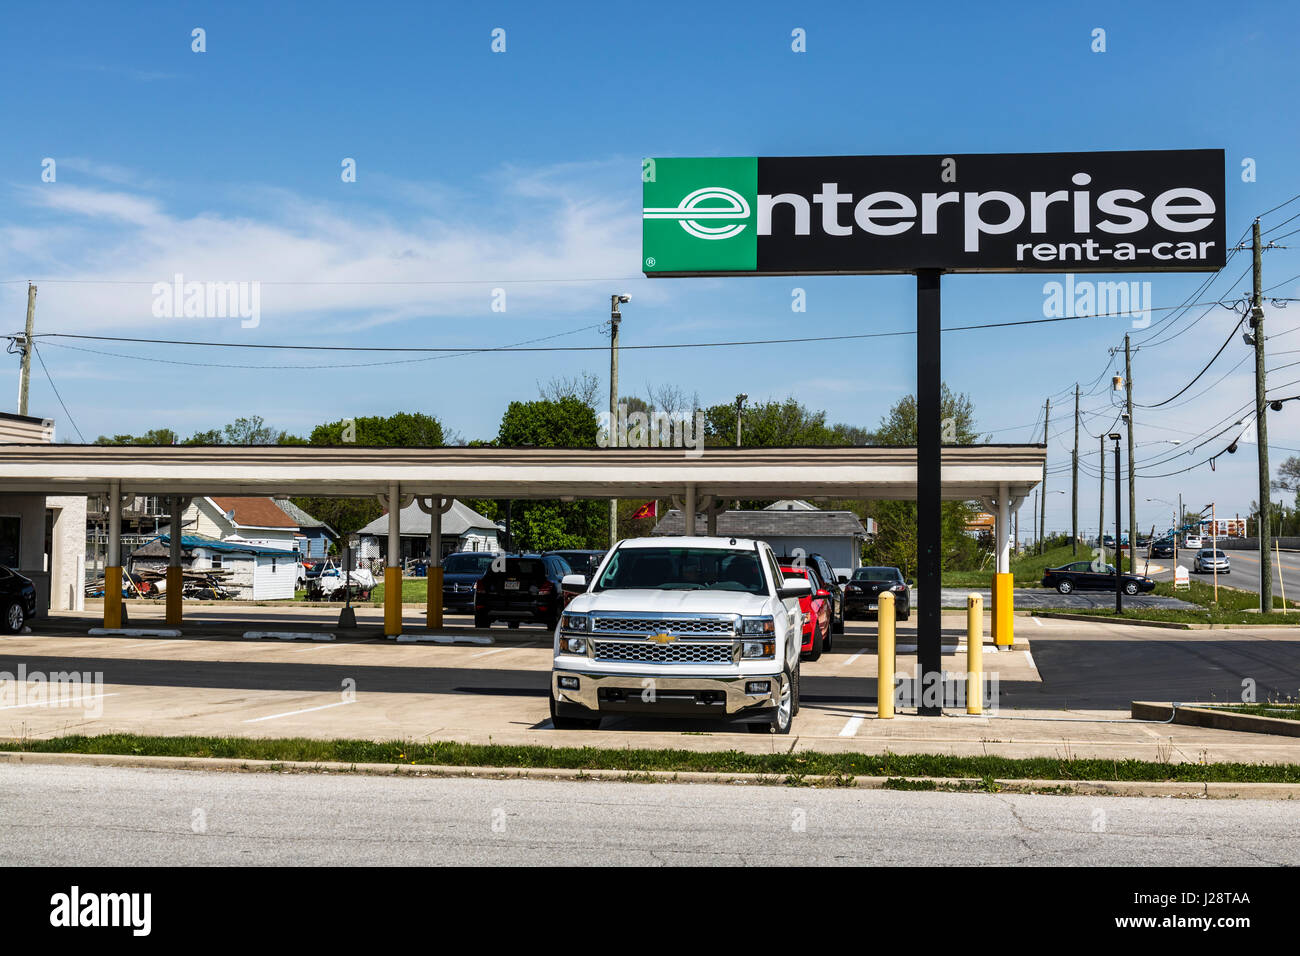 Marion - Circa April 2017 Enterprise Rent-A-Car Local Rental Location. Enterprise Rent-A-Car is the largest rental car company in the US II & Marion - Circa April 2017: Enterprise Rent-A-Car Local Rental ...